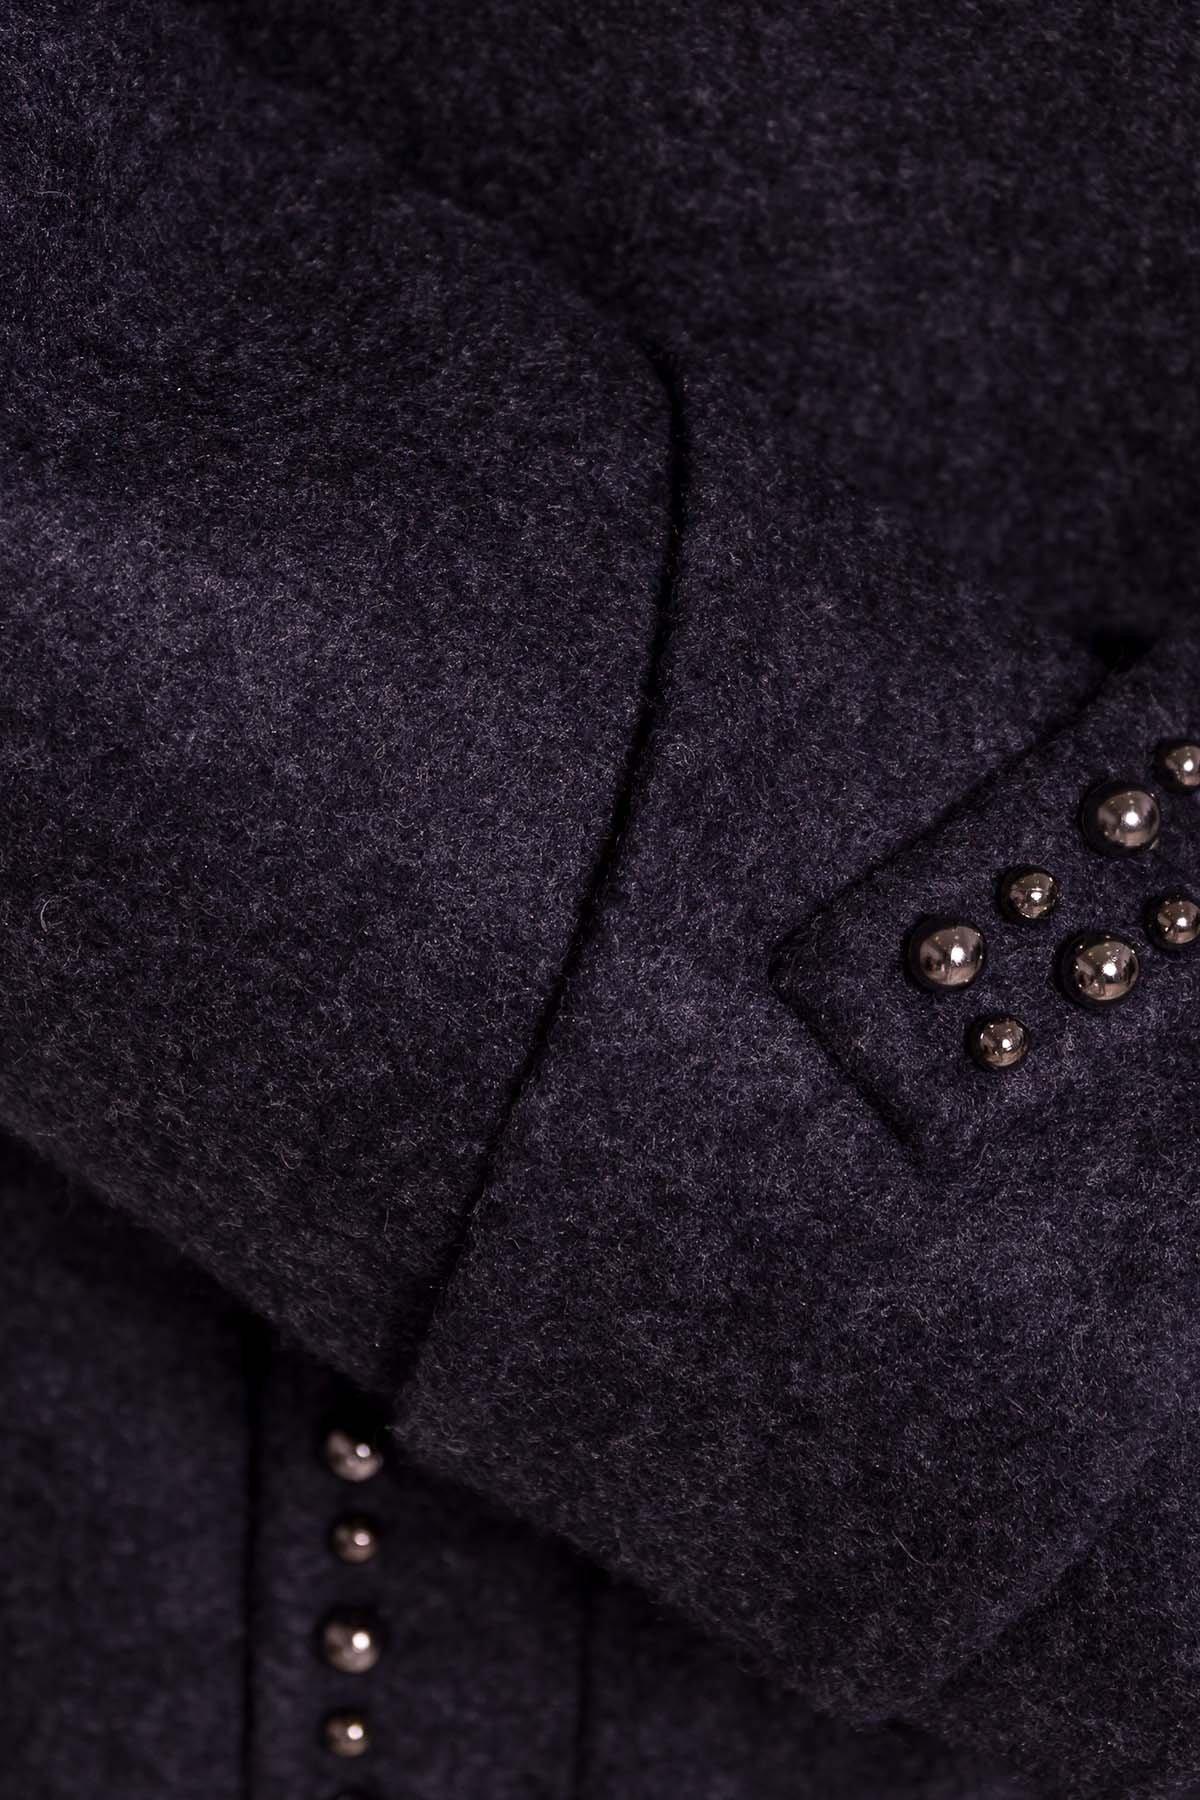 Пальто Анси 4544 АРТ. 21594 Цвет: Темно-синий - фото 7, интернет магазин tm-modus.ru